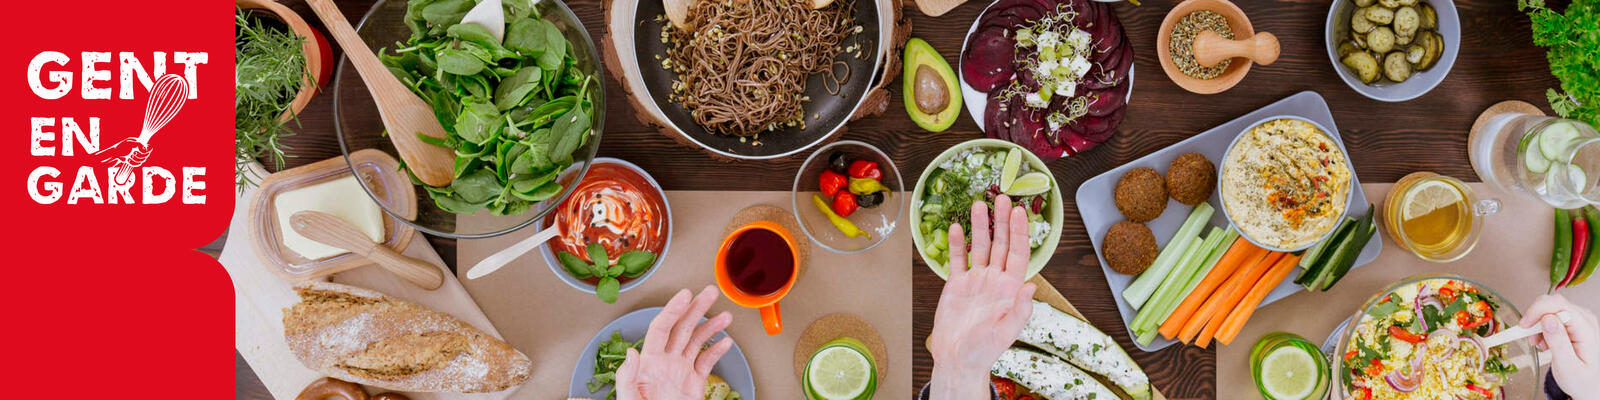 Partnerdag Voedselraad webbanner zonder tekst